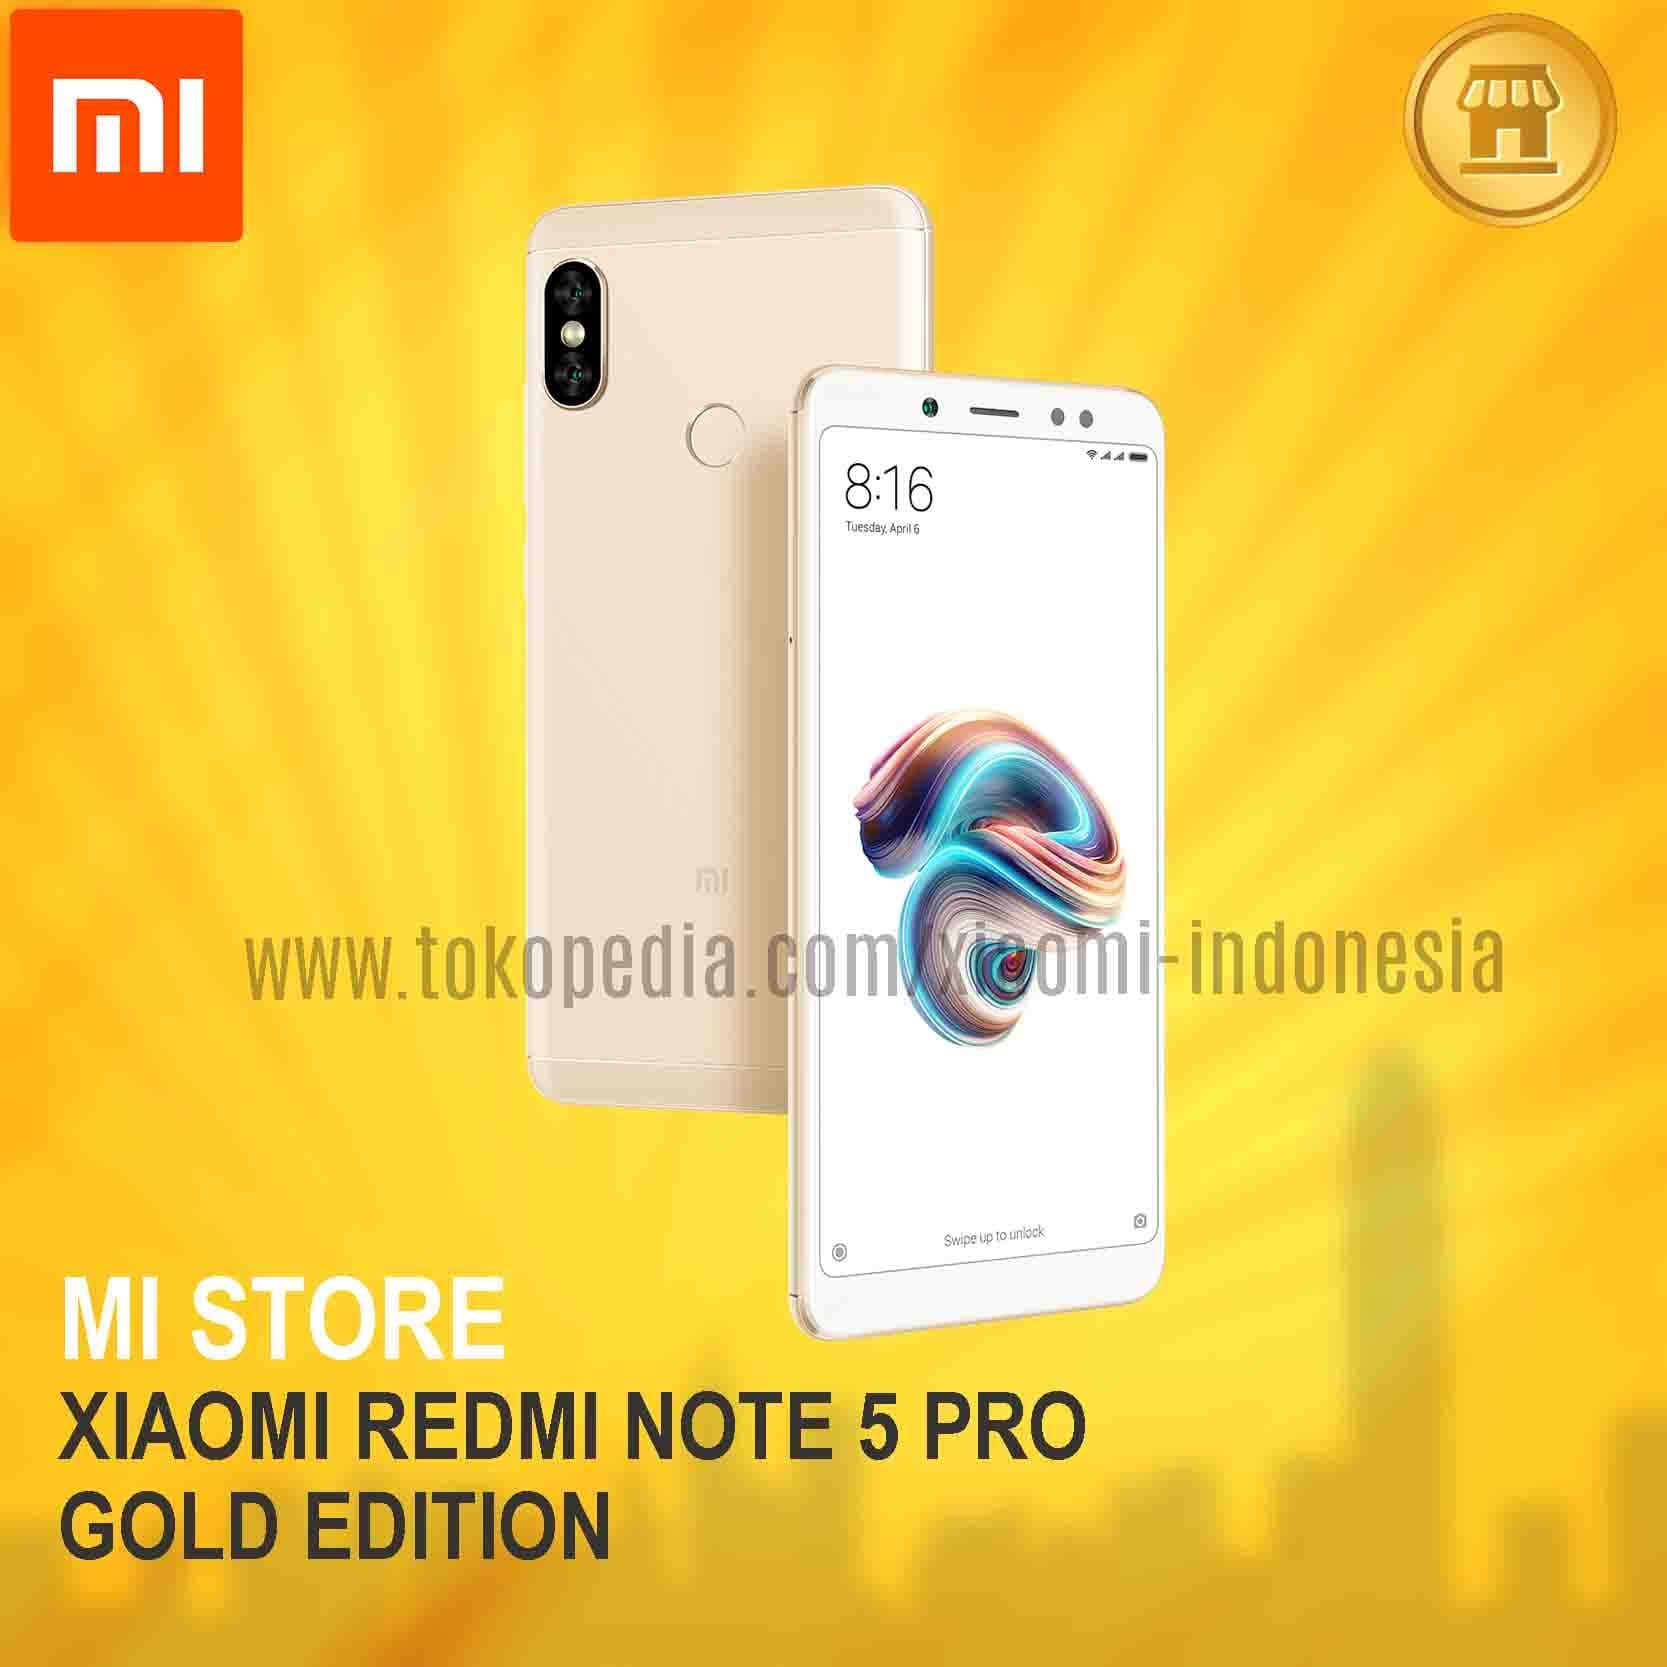 Xiaomi Redmi Note 5 Pro - Gold